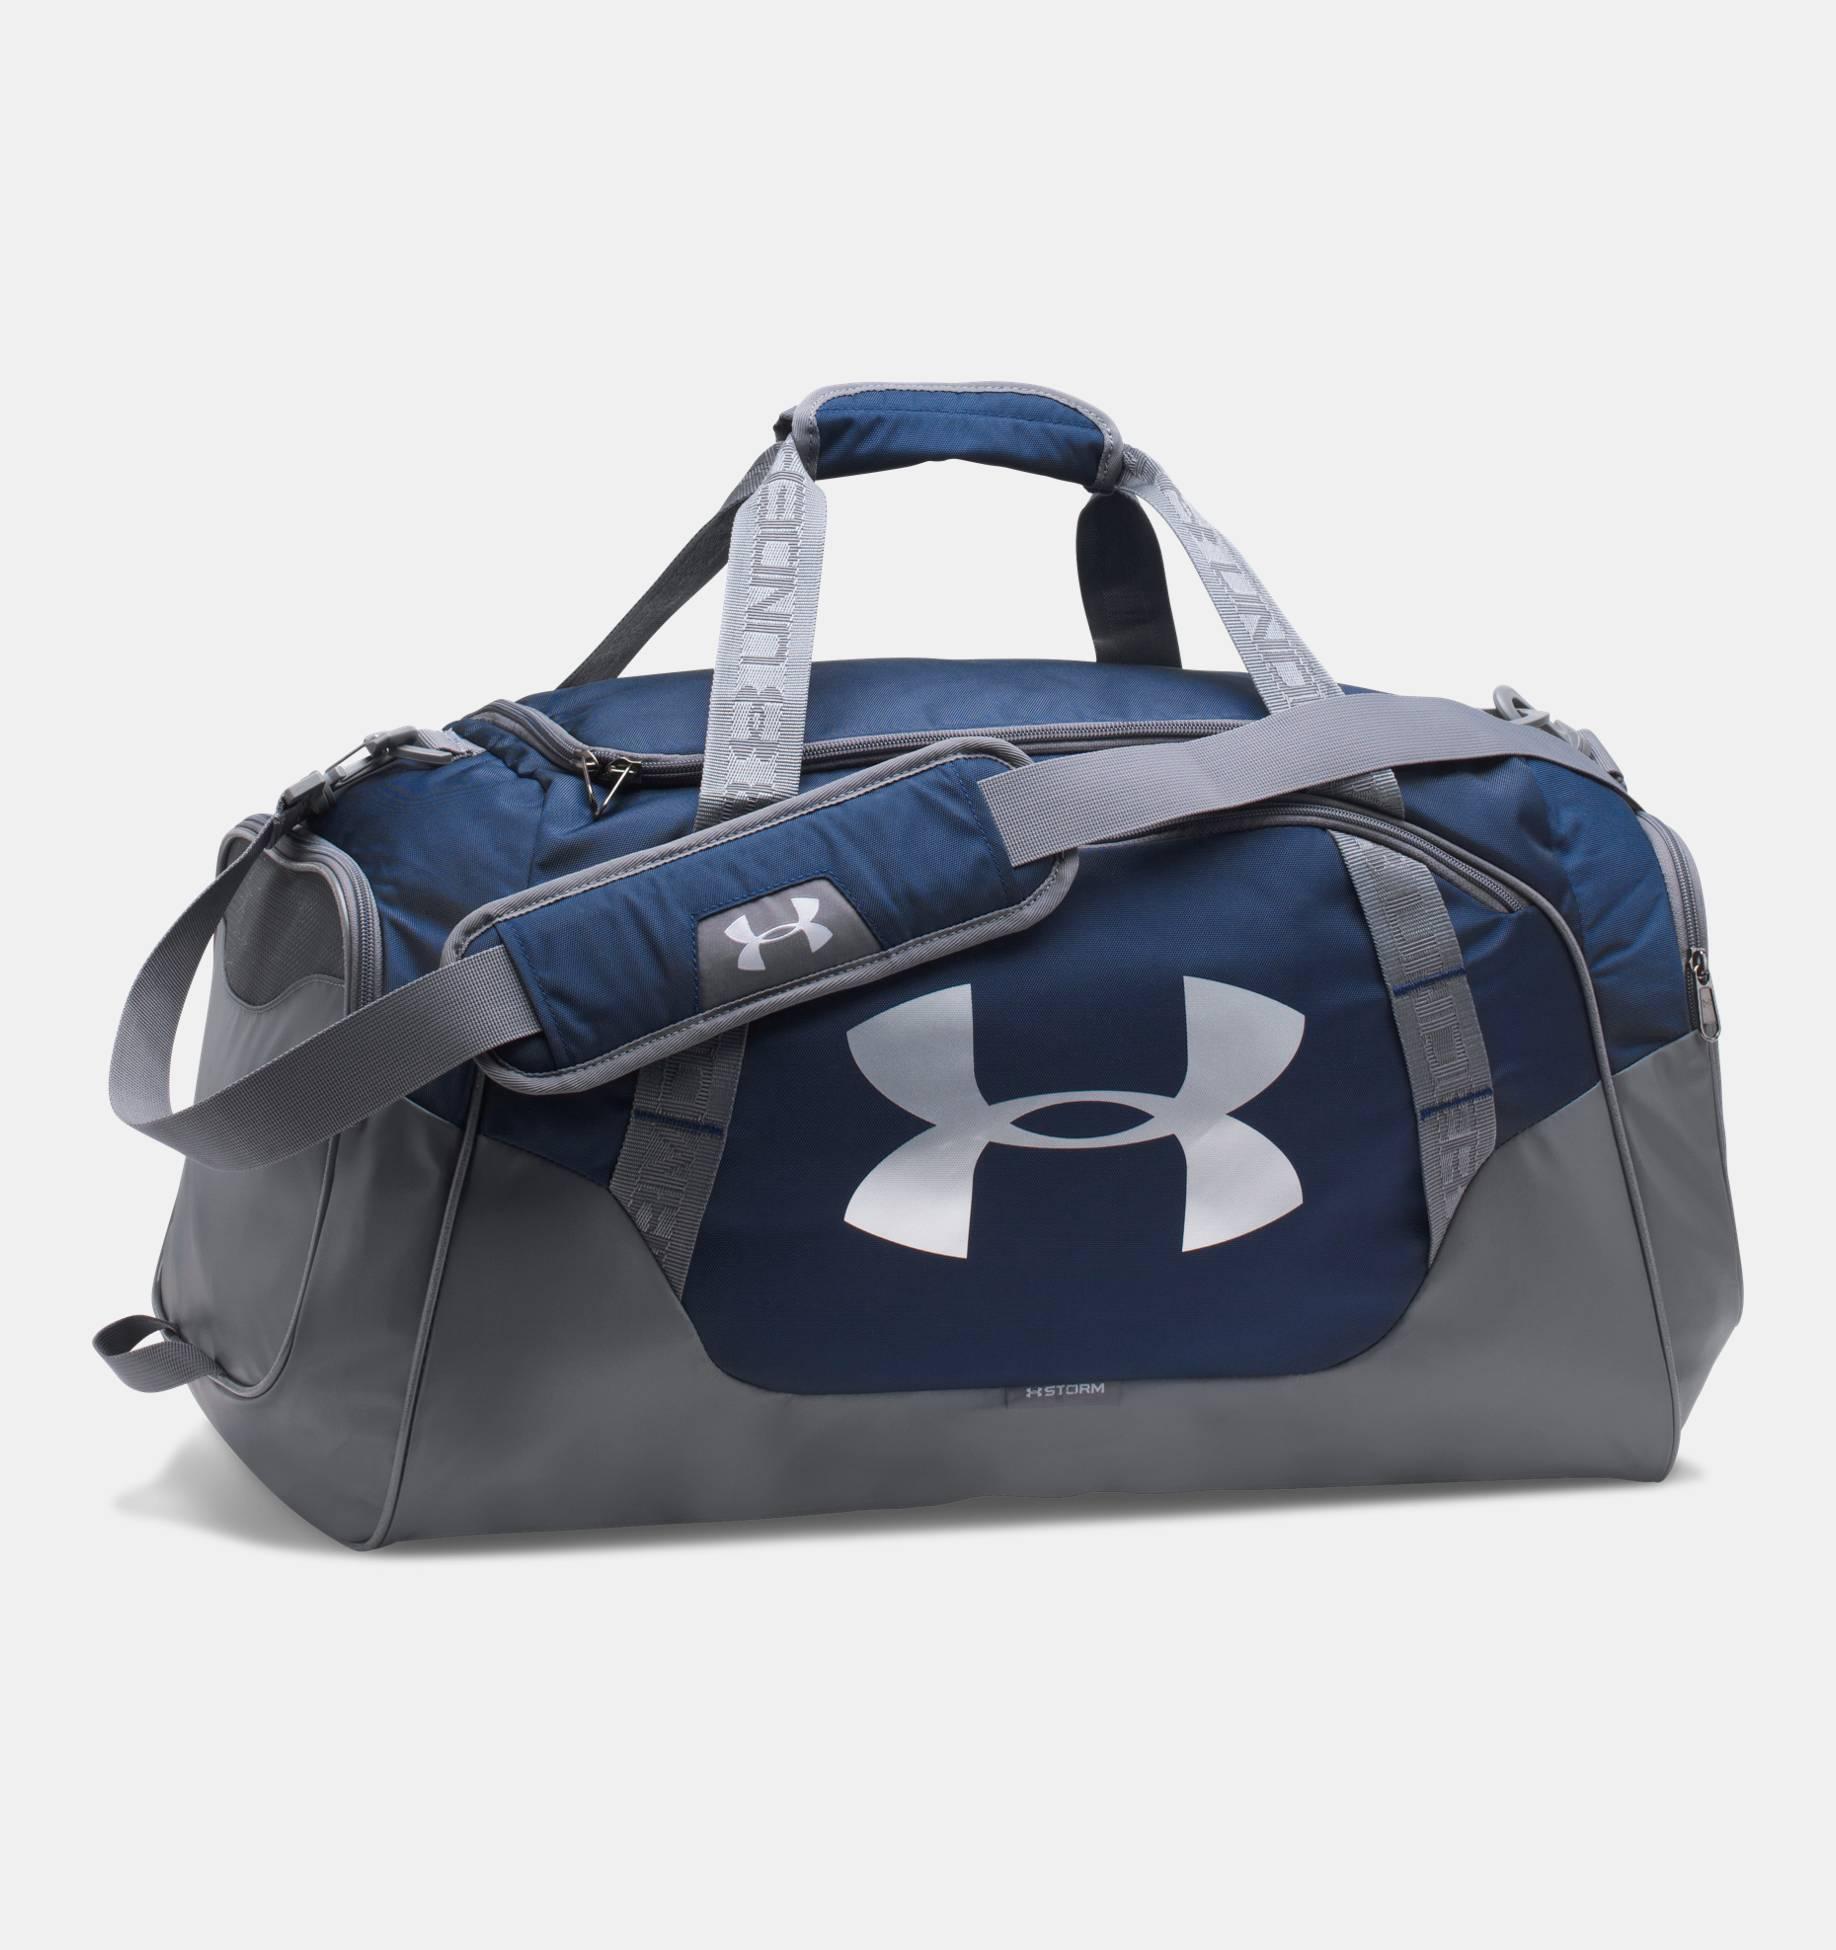 9e6a9448368 Under Armour Undeniable 3.0 Medium Duffle Bag 1300213